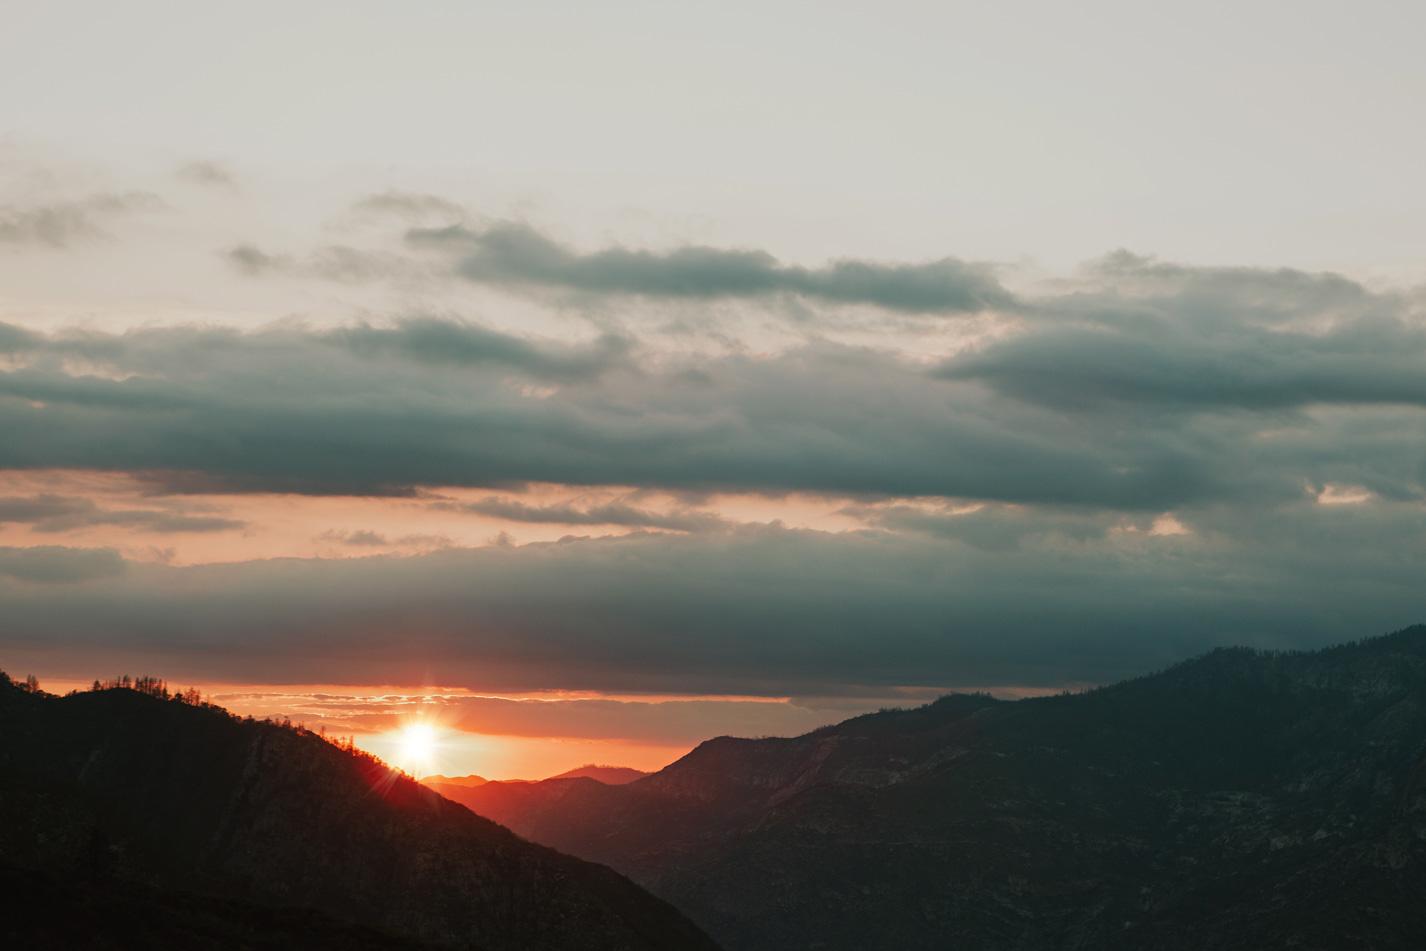 CindyGiovagnoli_Kings_Canyon_National_Park_hike_firetower_lookout_sunset-024.jpg